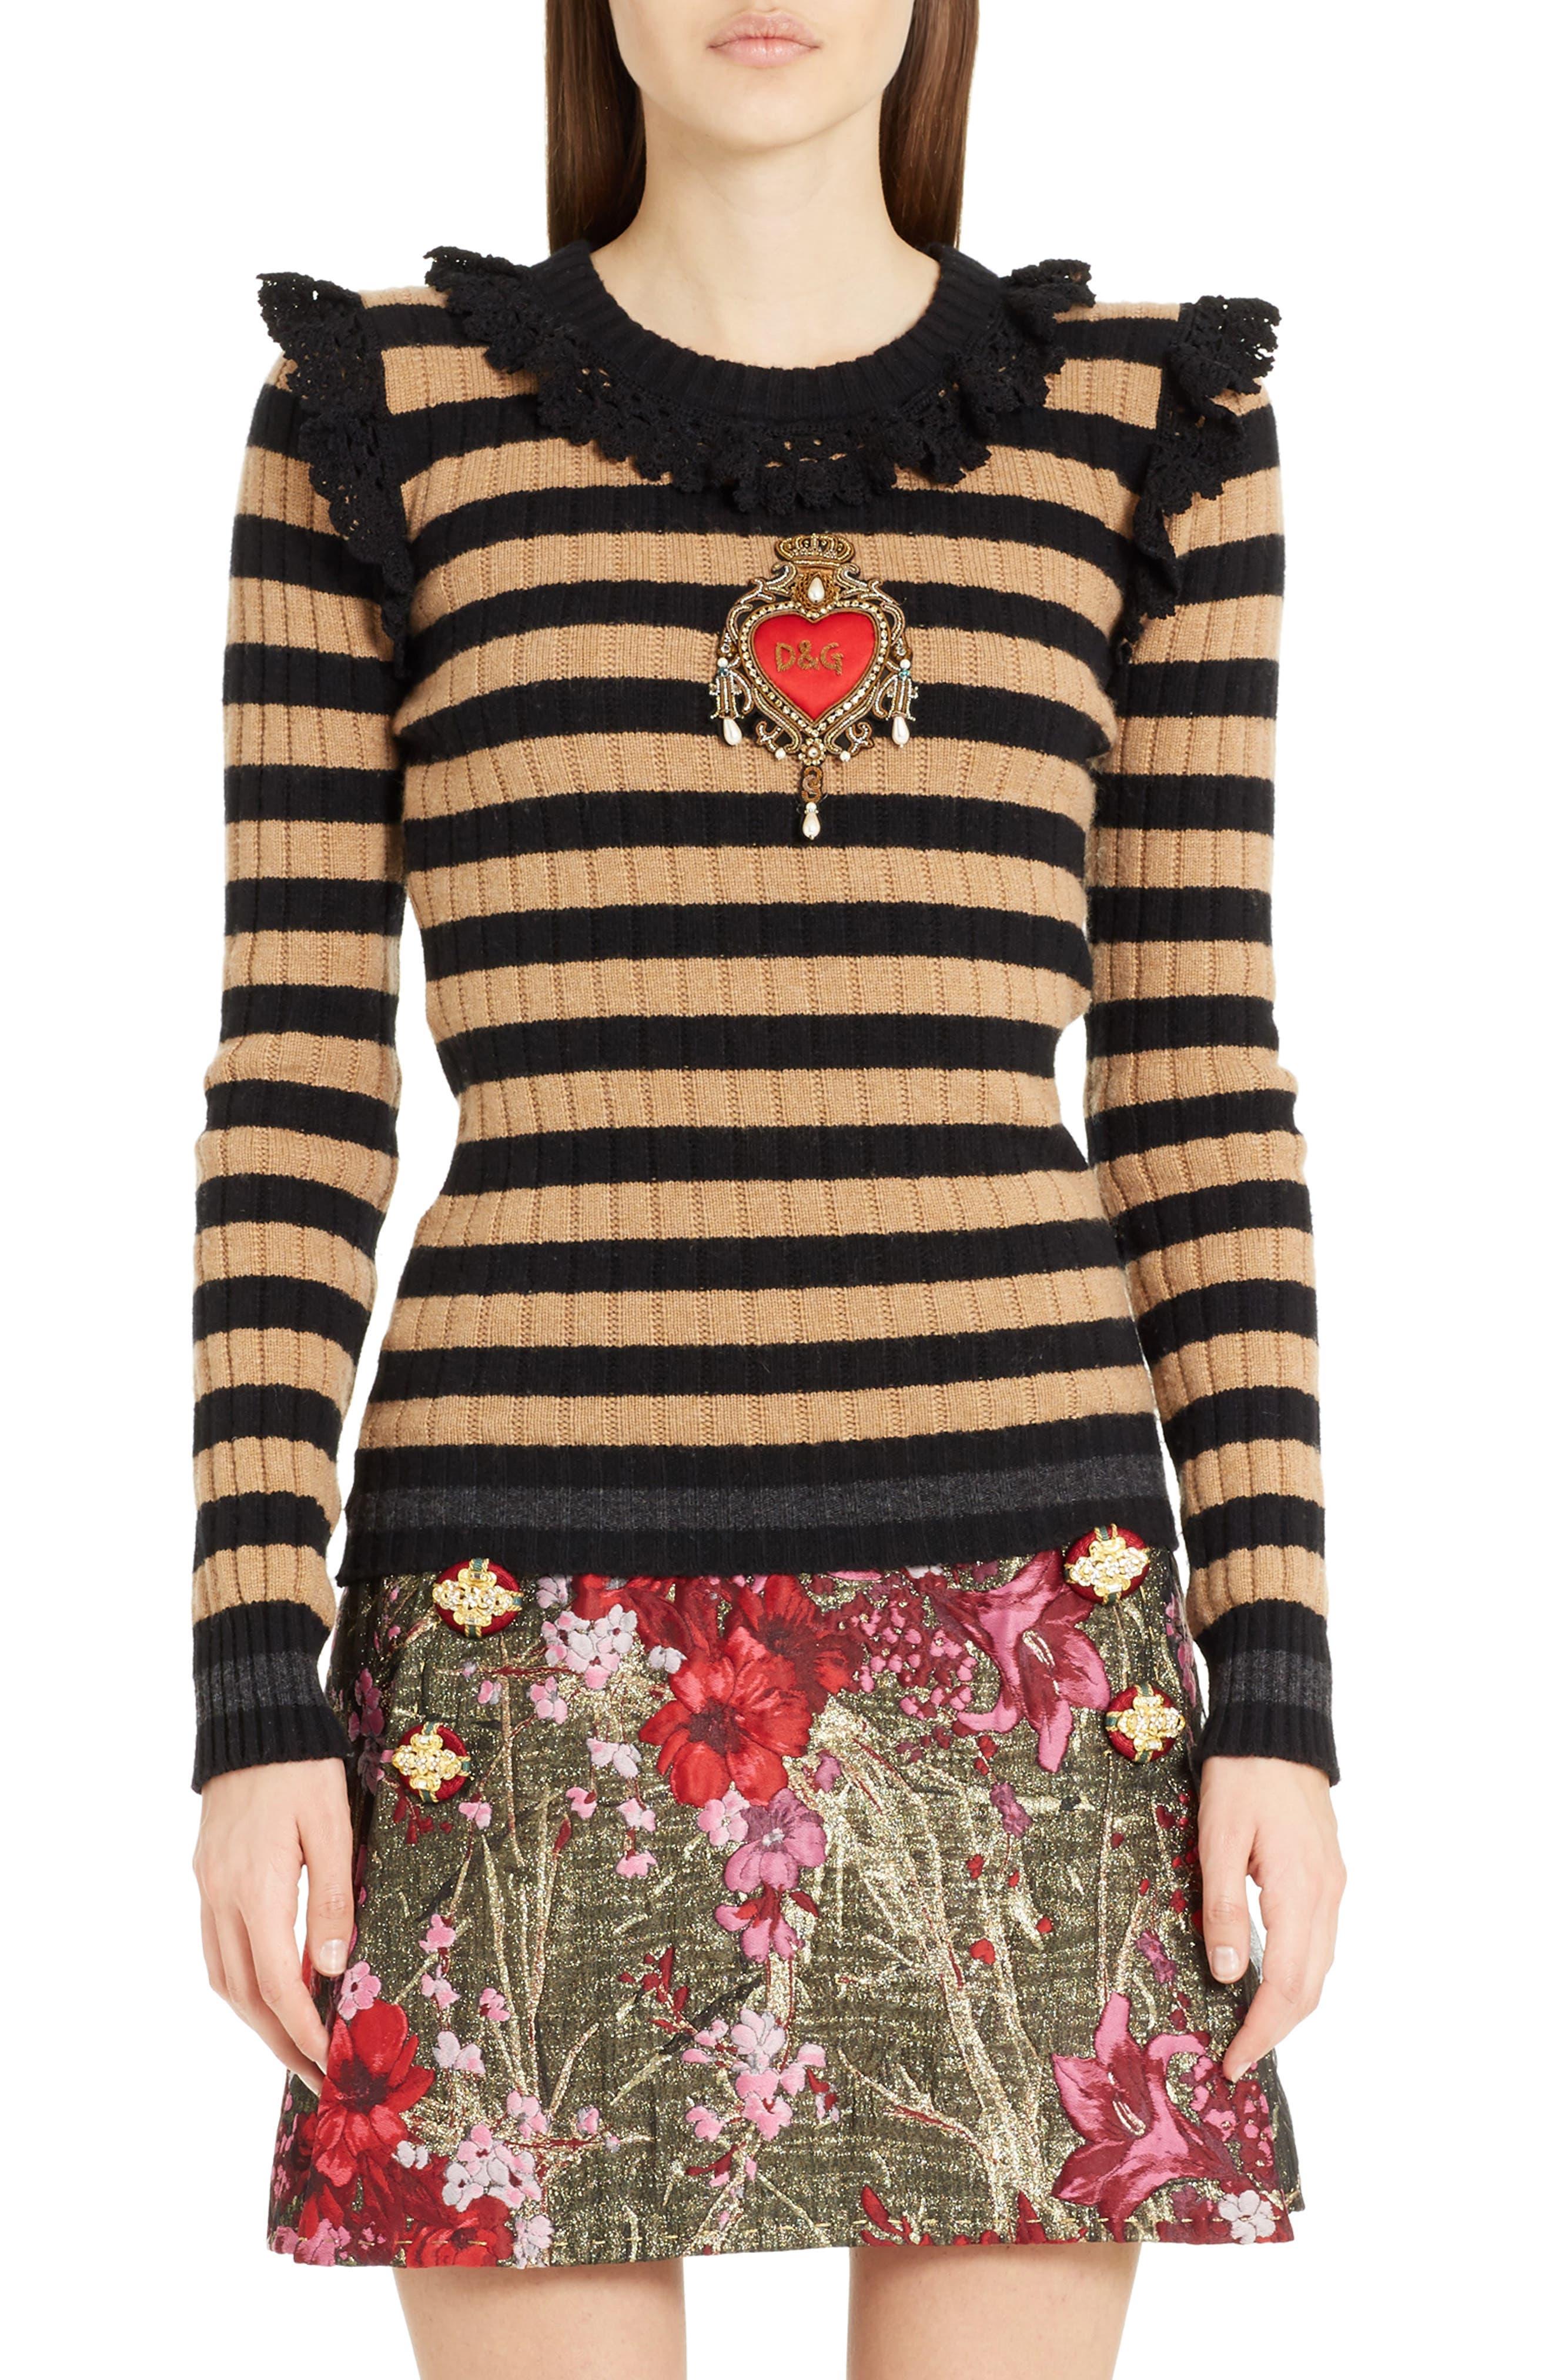 Heart Patch Stripe Wool & Cashmere Sweater,                             Main thumbnail 1, color,                             Camel/ Black Stripe